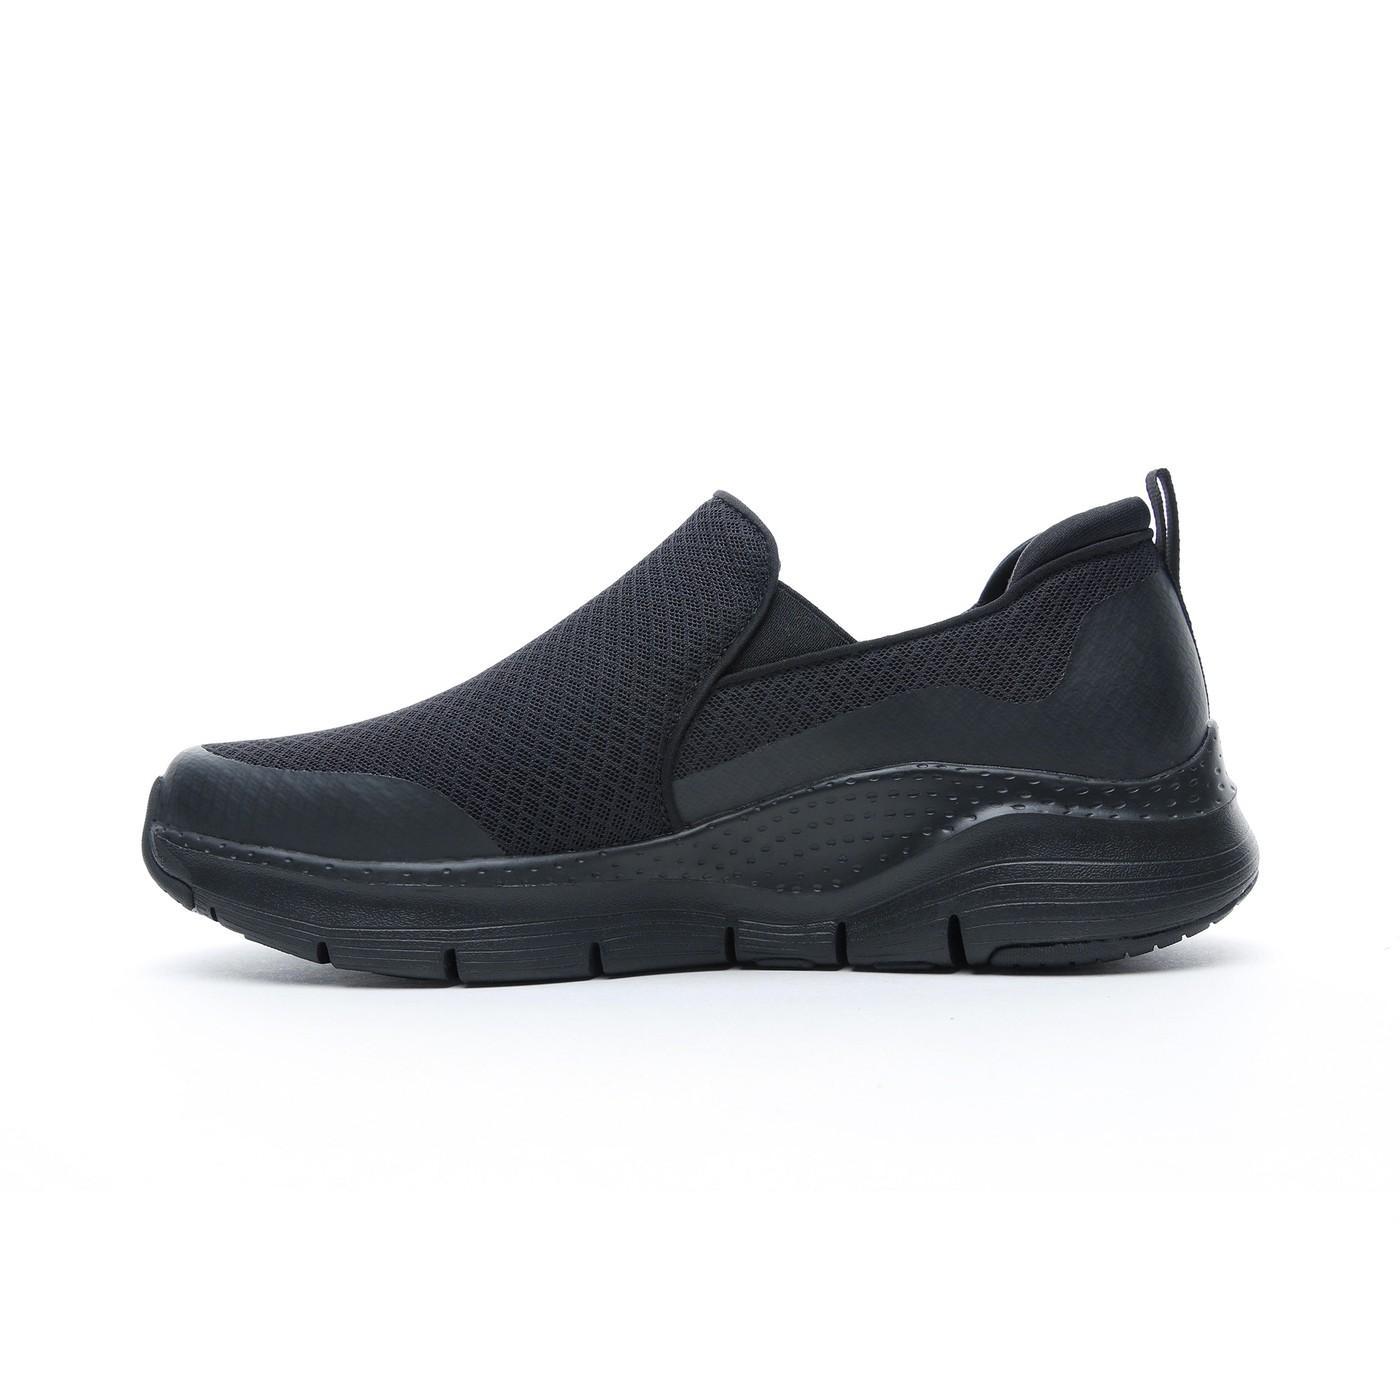 Skechers Arch Fit - Banlin Erkek Siyah Spor Ayakkabı